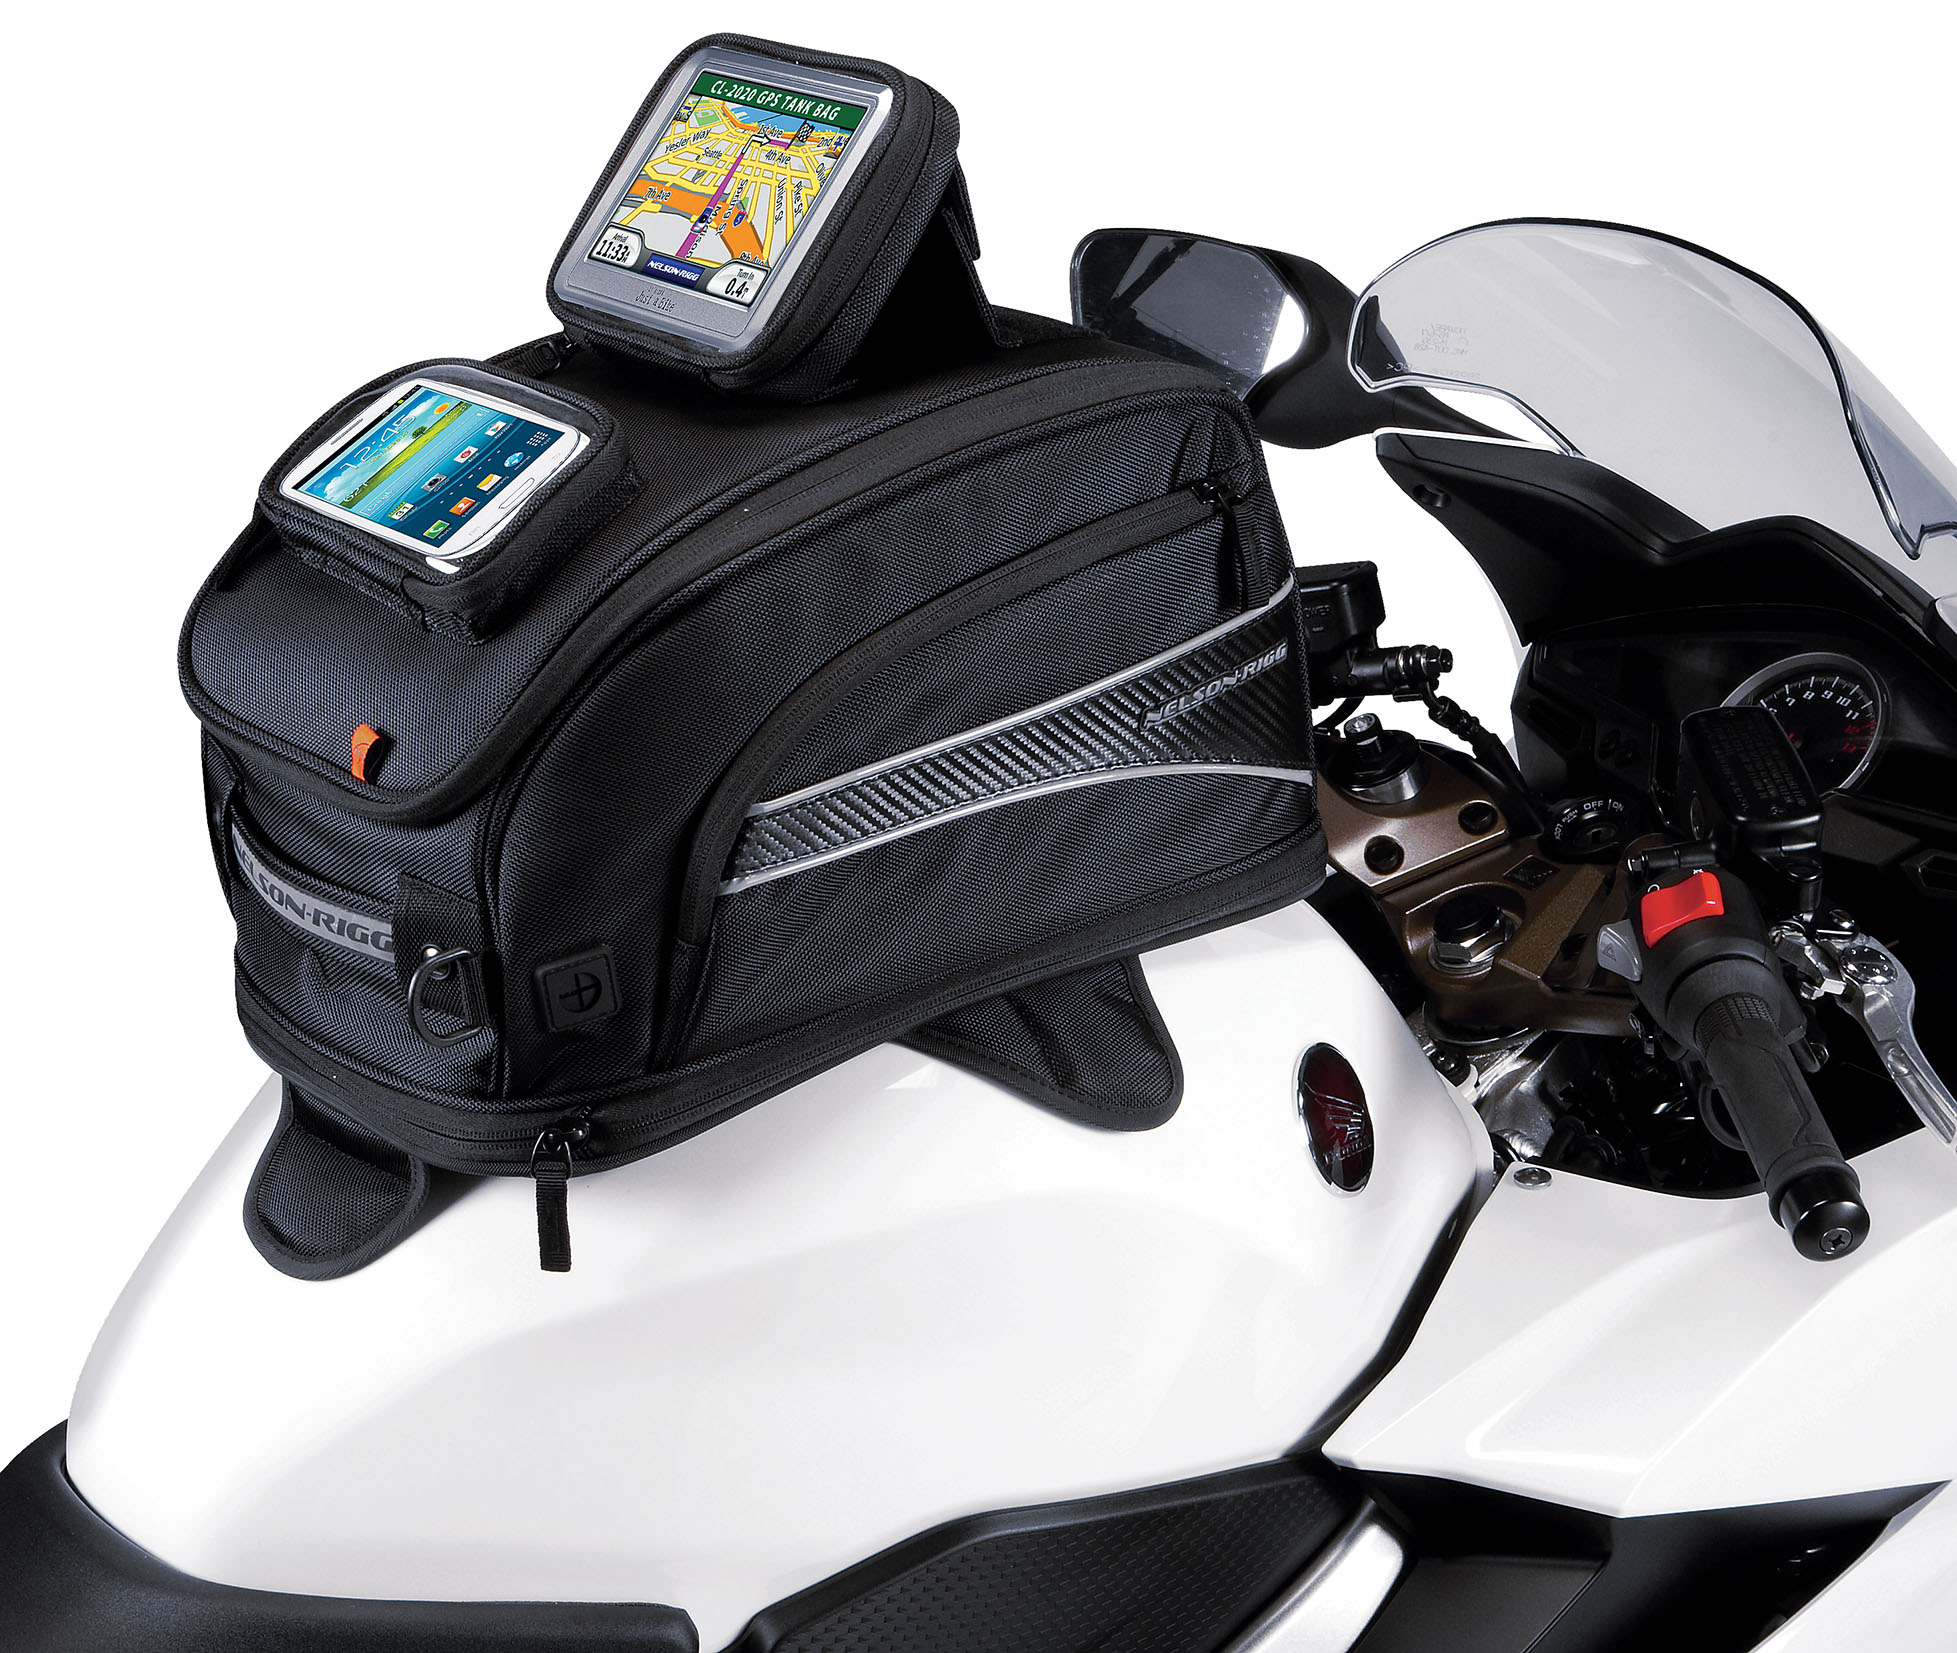 Cl 2020 Gps Sport Motorcycle Tank Bag Image